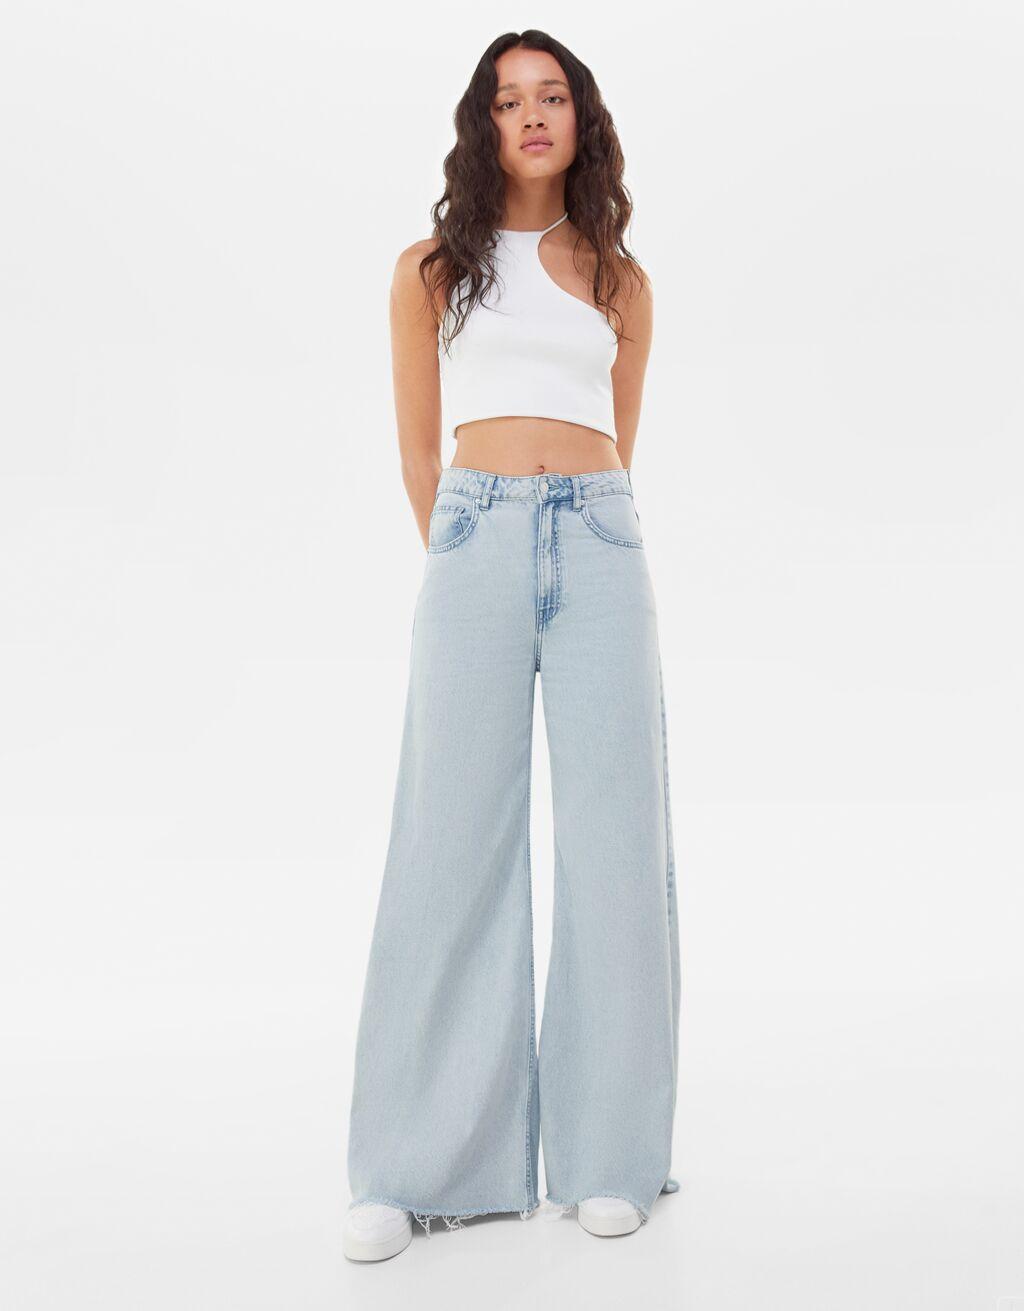 Jeans de diseño palazzo